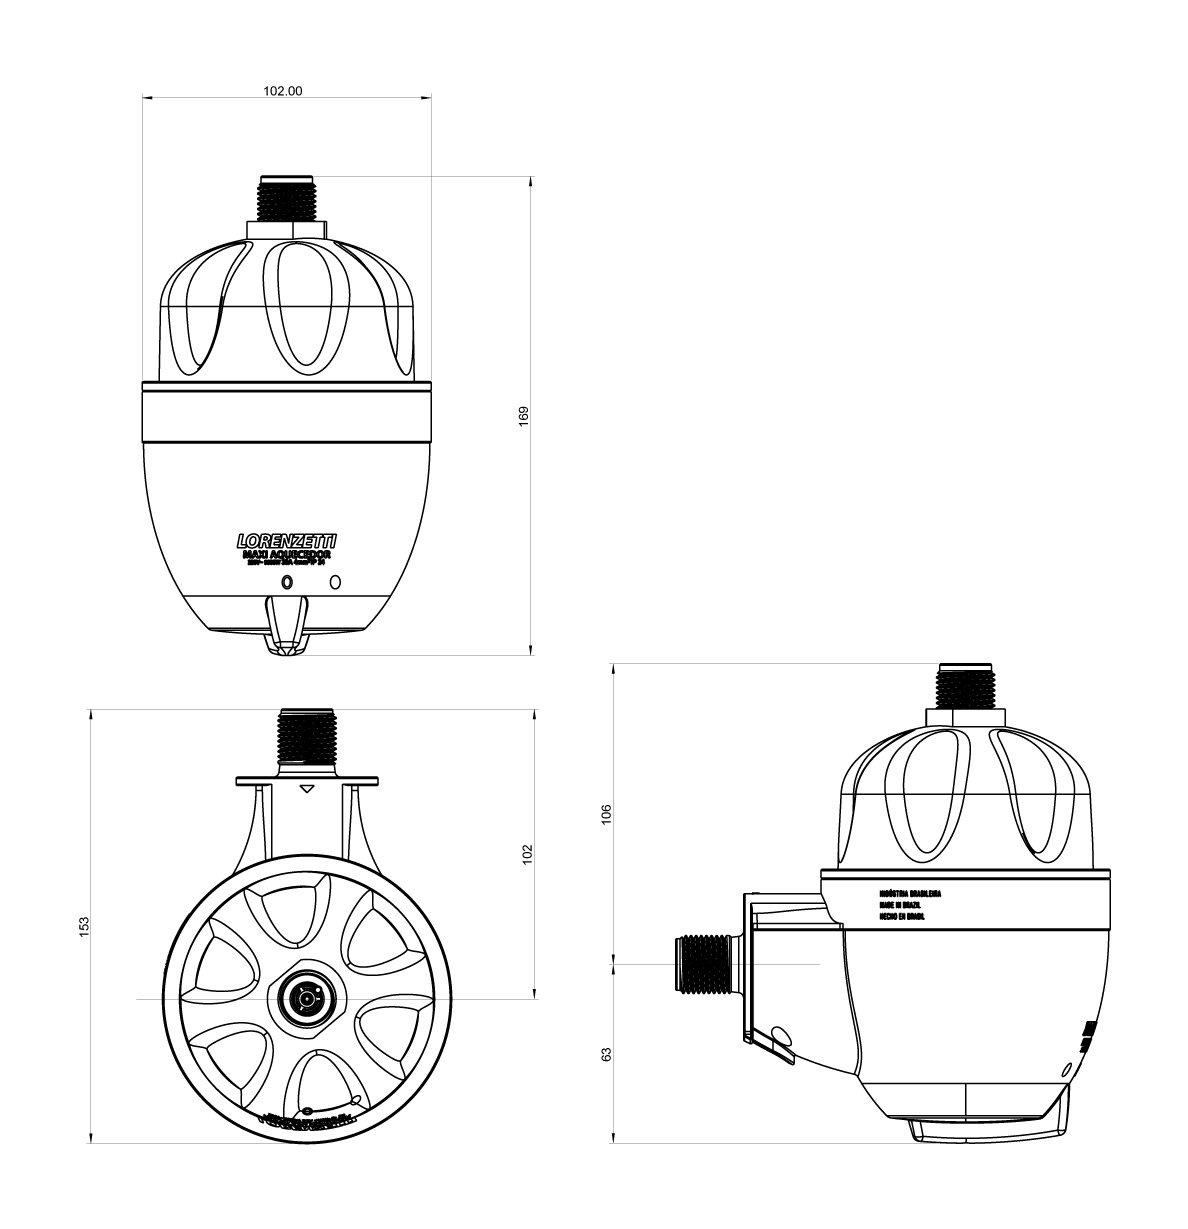 Aquecedor Elétrico Maxi Ultra Lorenzetti 220V 5500W